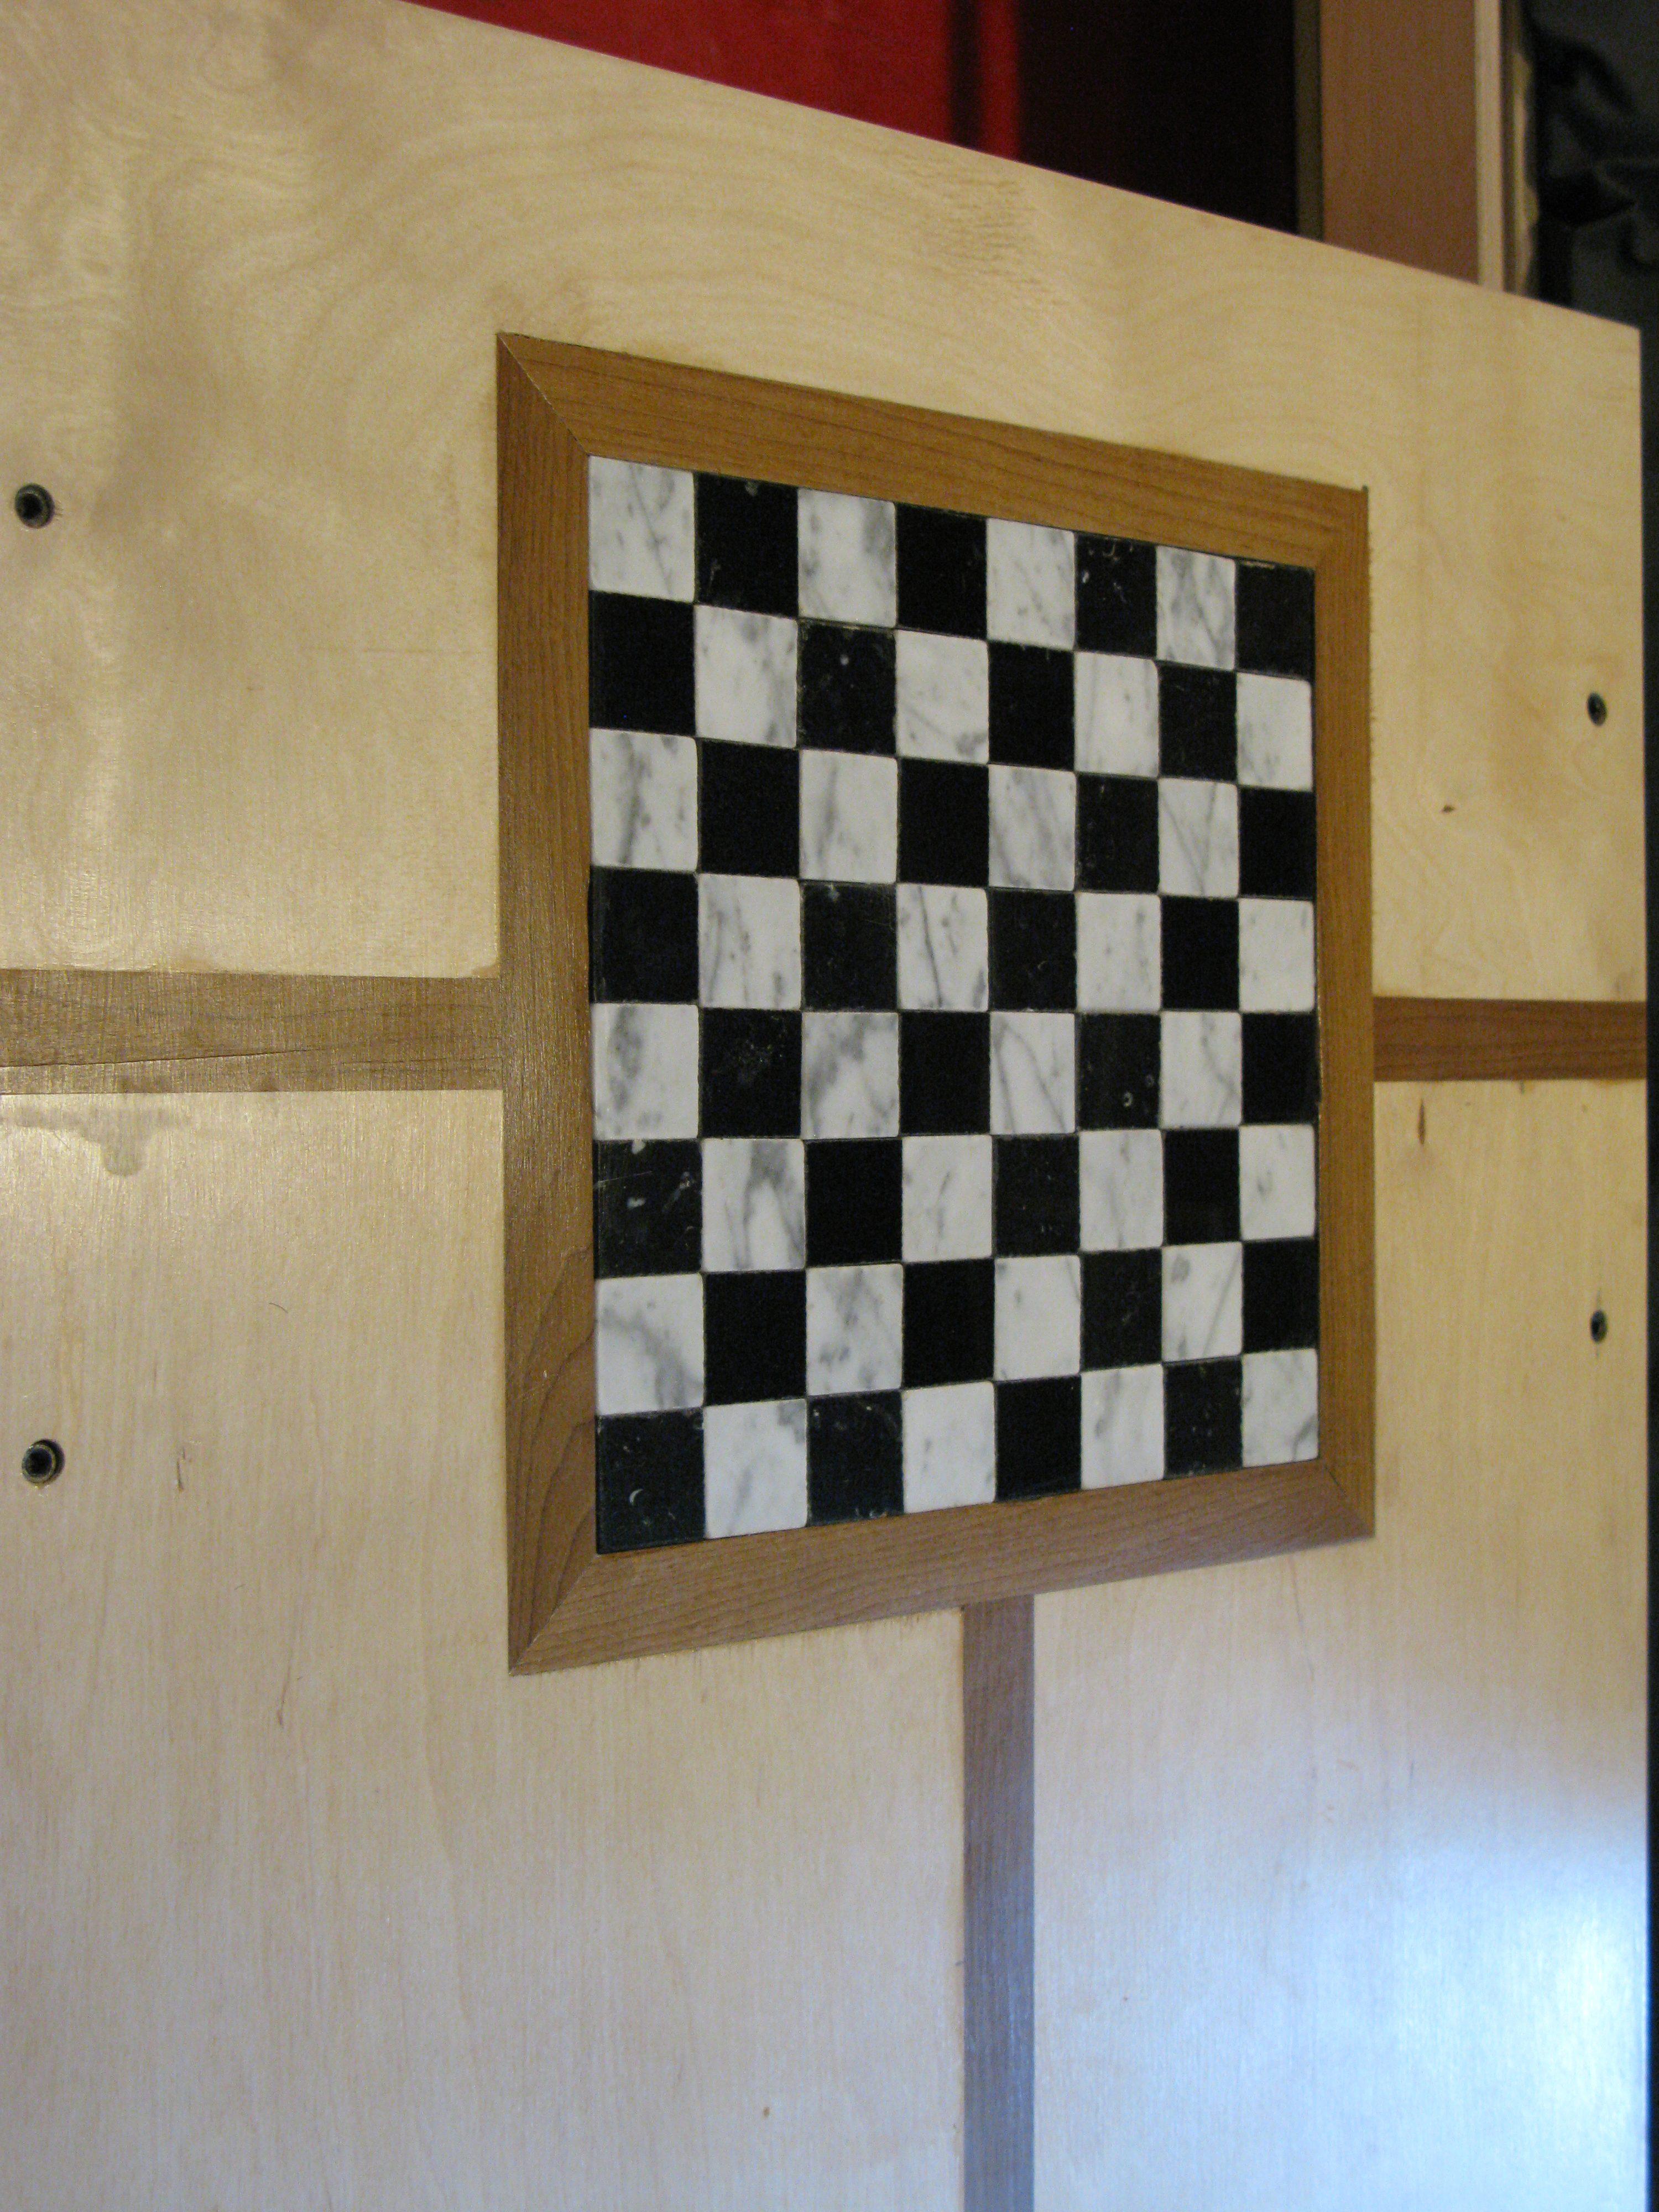 chesstable1